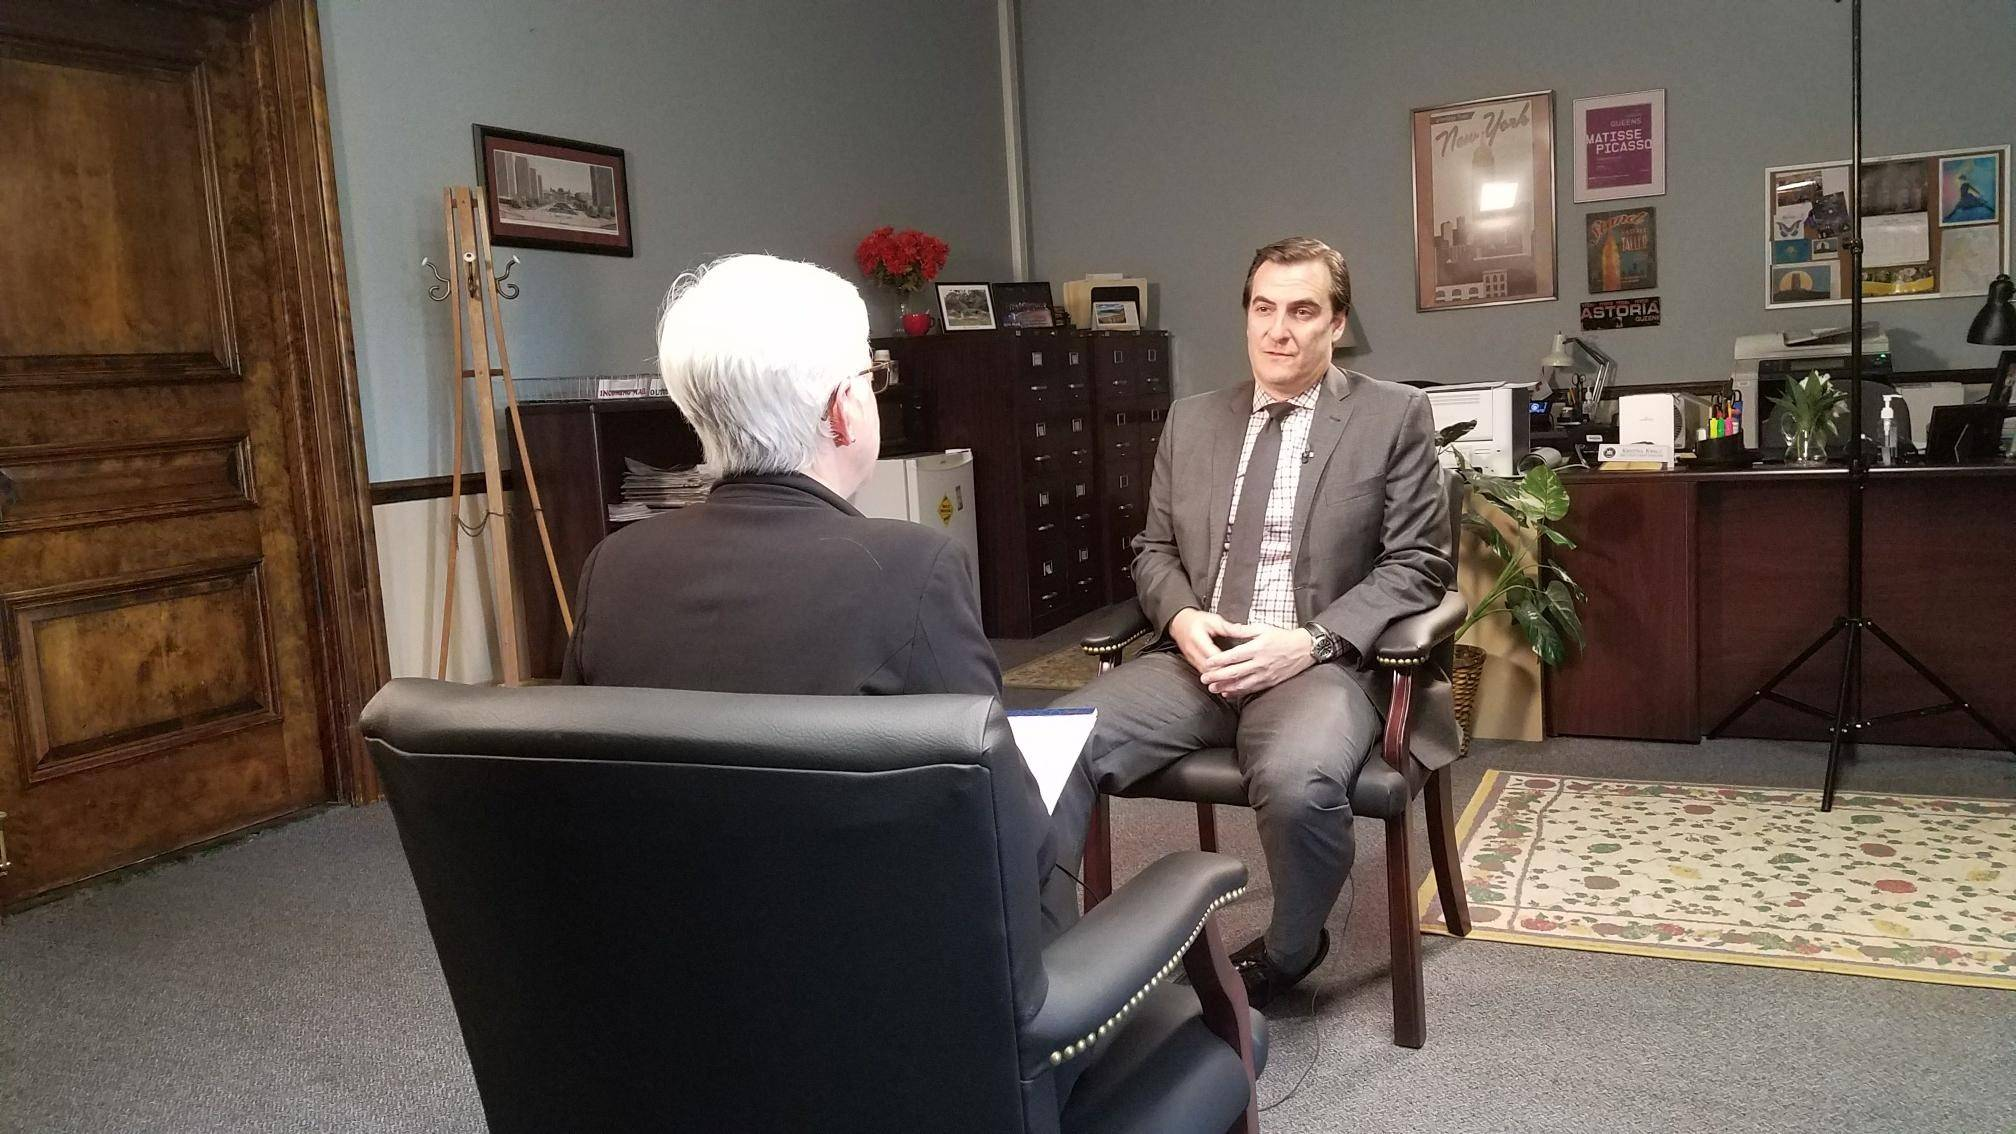 Gianaris on Senate dysfunction, November election